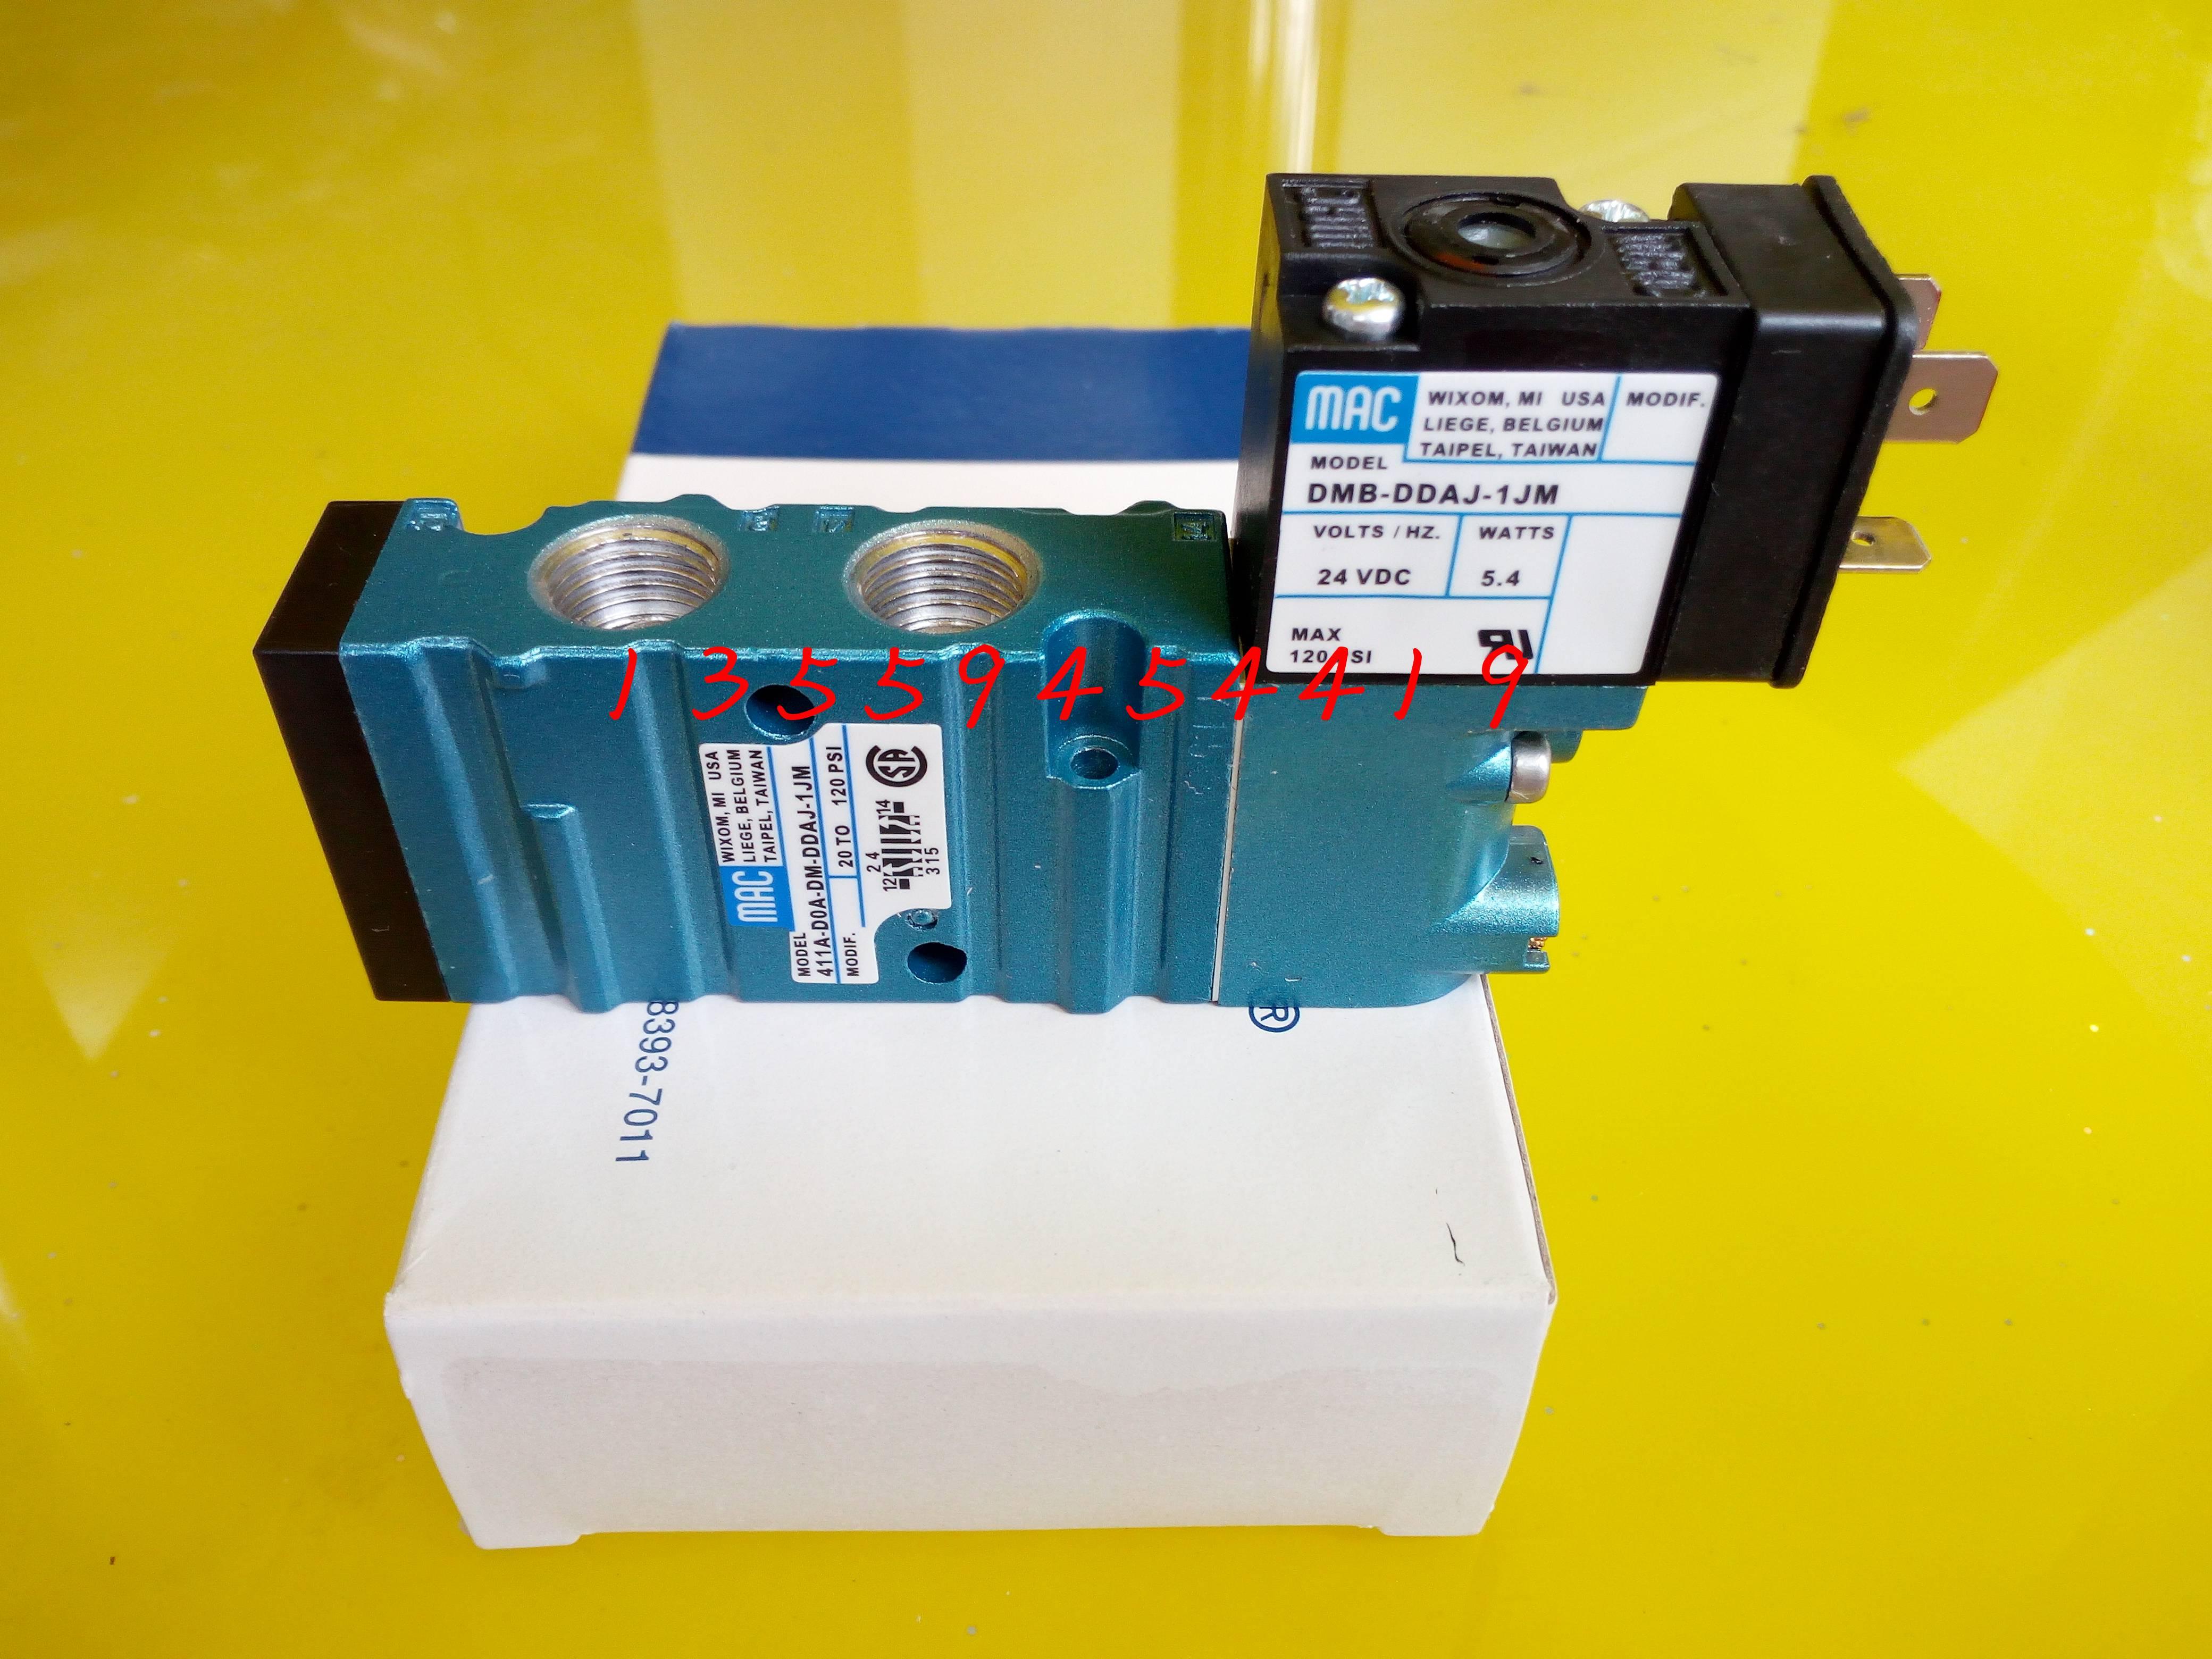 MAC solenoid valve 411A-D0A-DM-DDAJ-1JM original 1zk47a bargaining